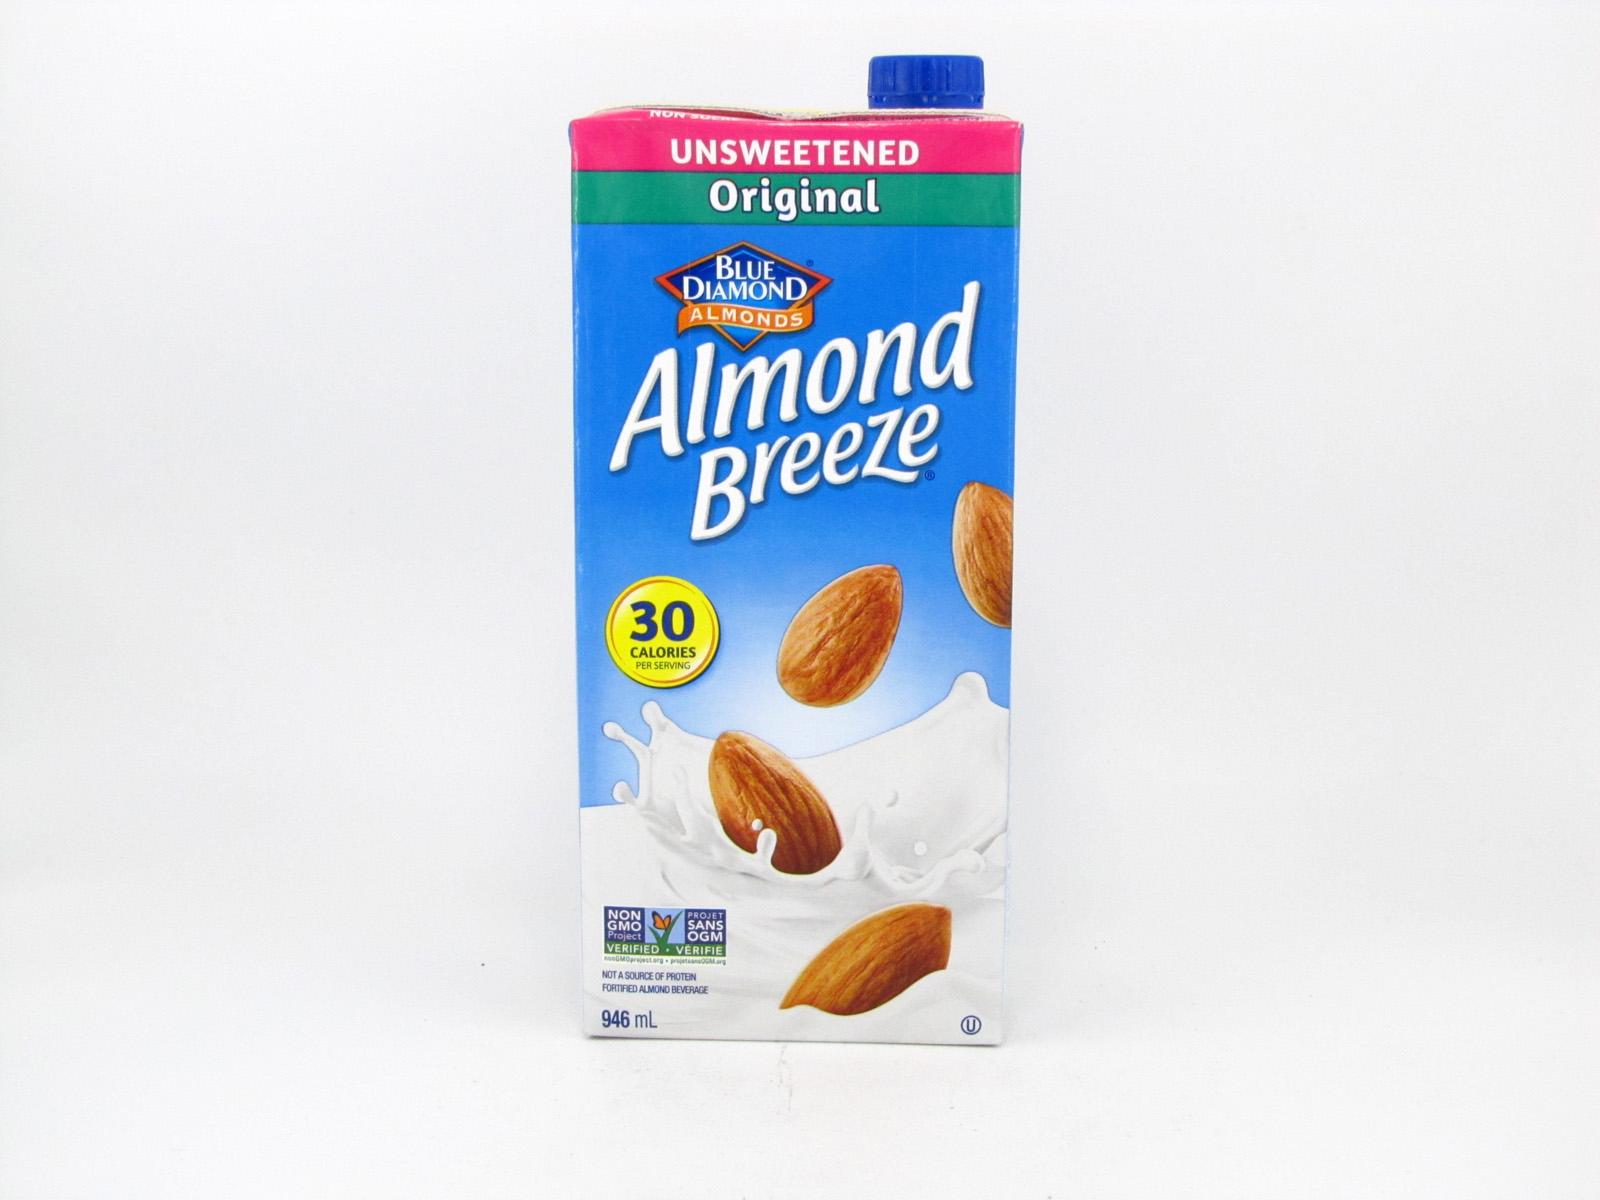 Almond Breeze Original - front view